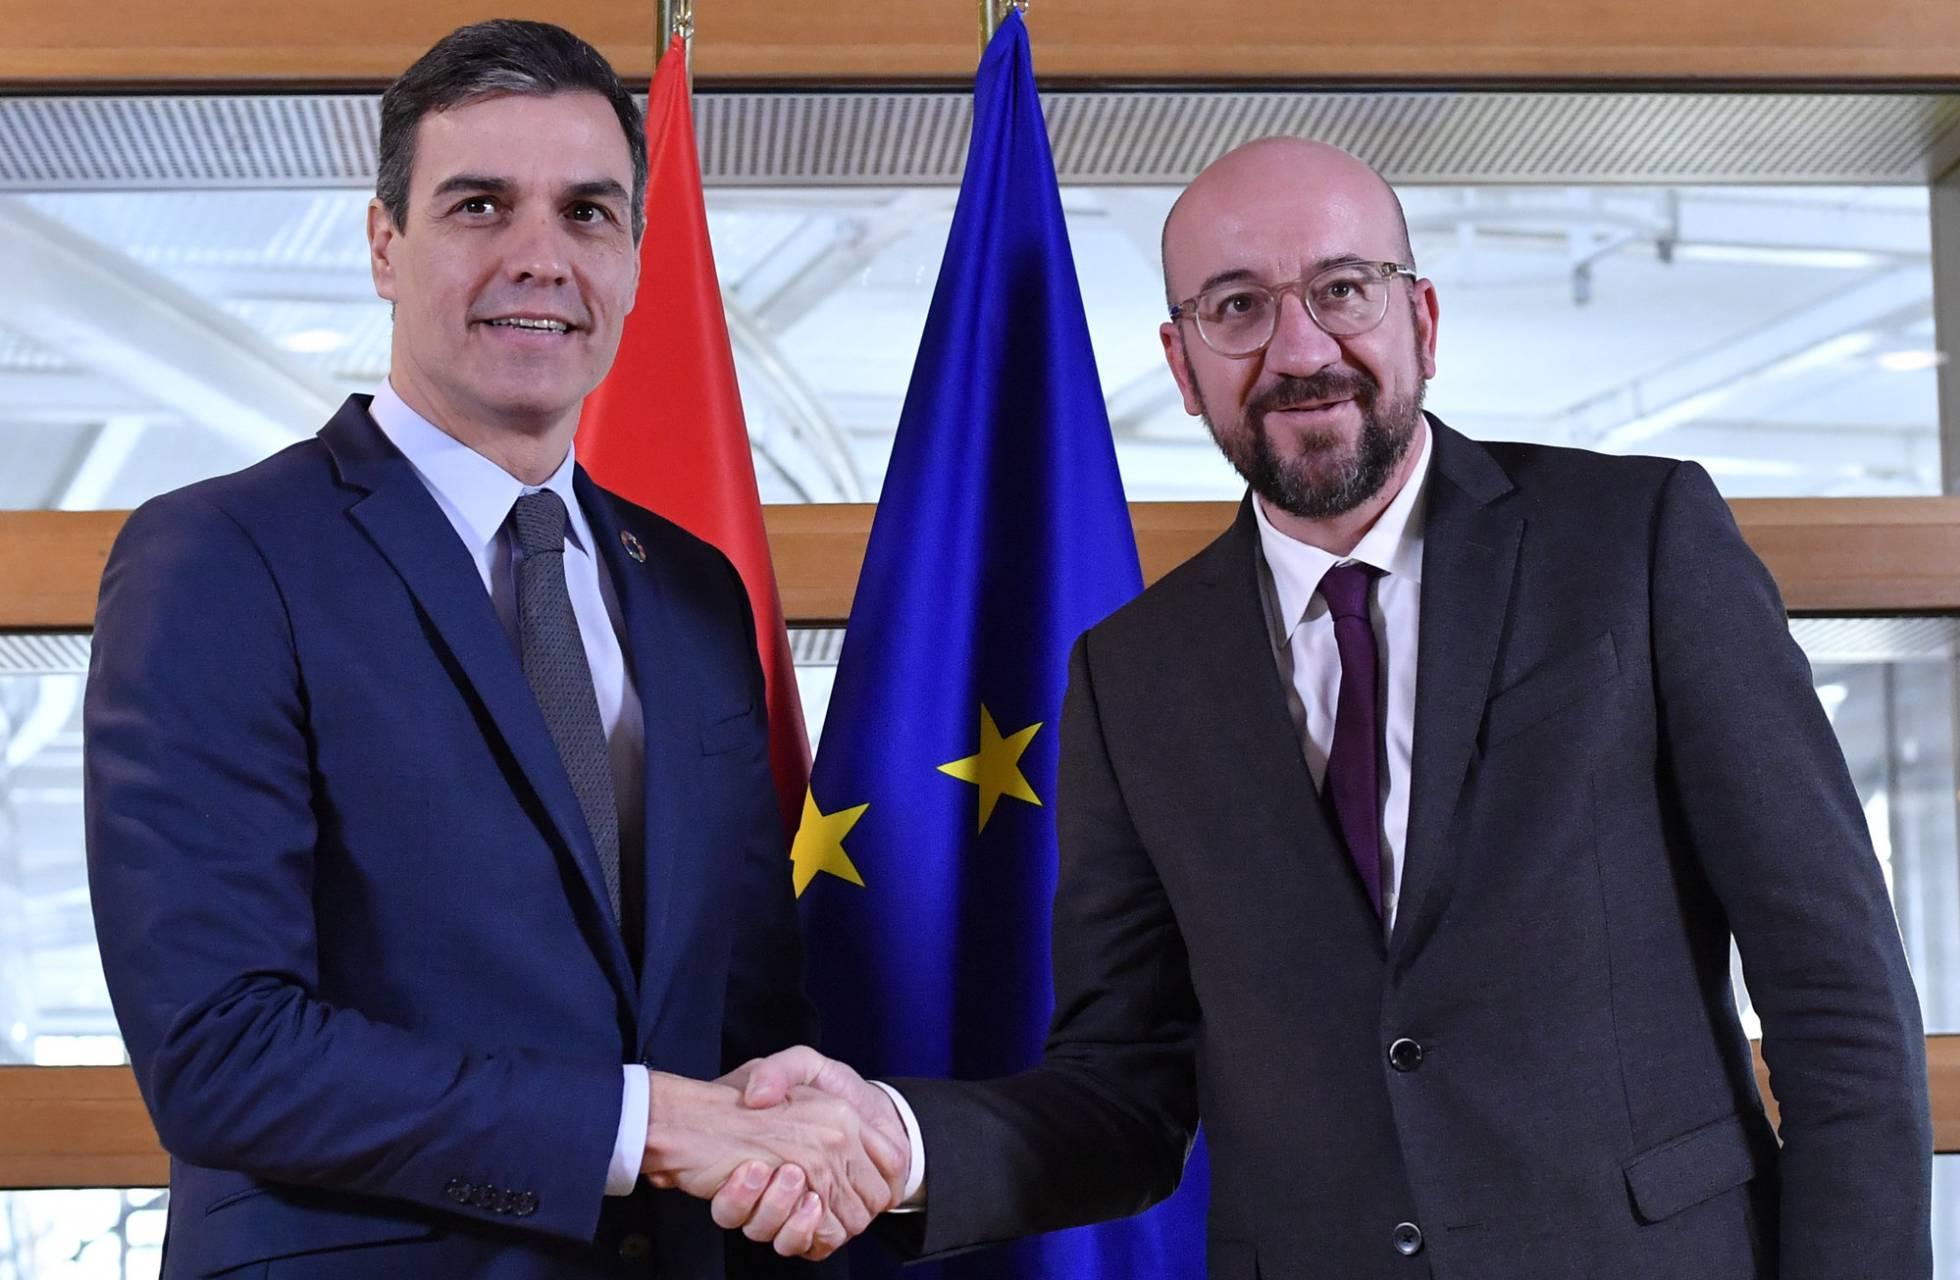 Internacional, UE, Bruselas, fondos, Europa, Charles Michel